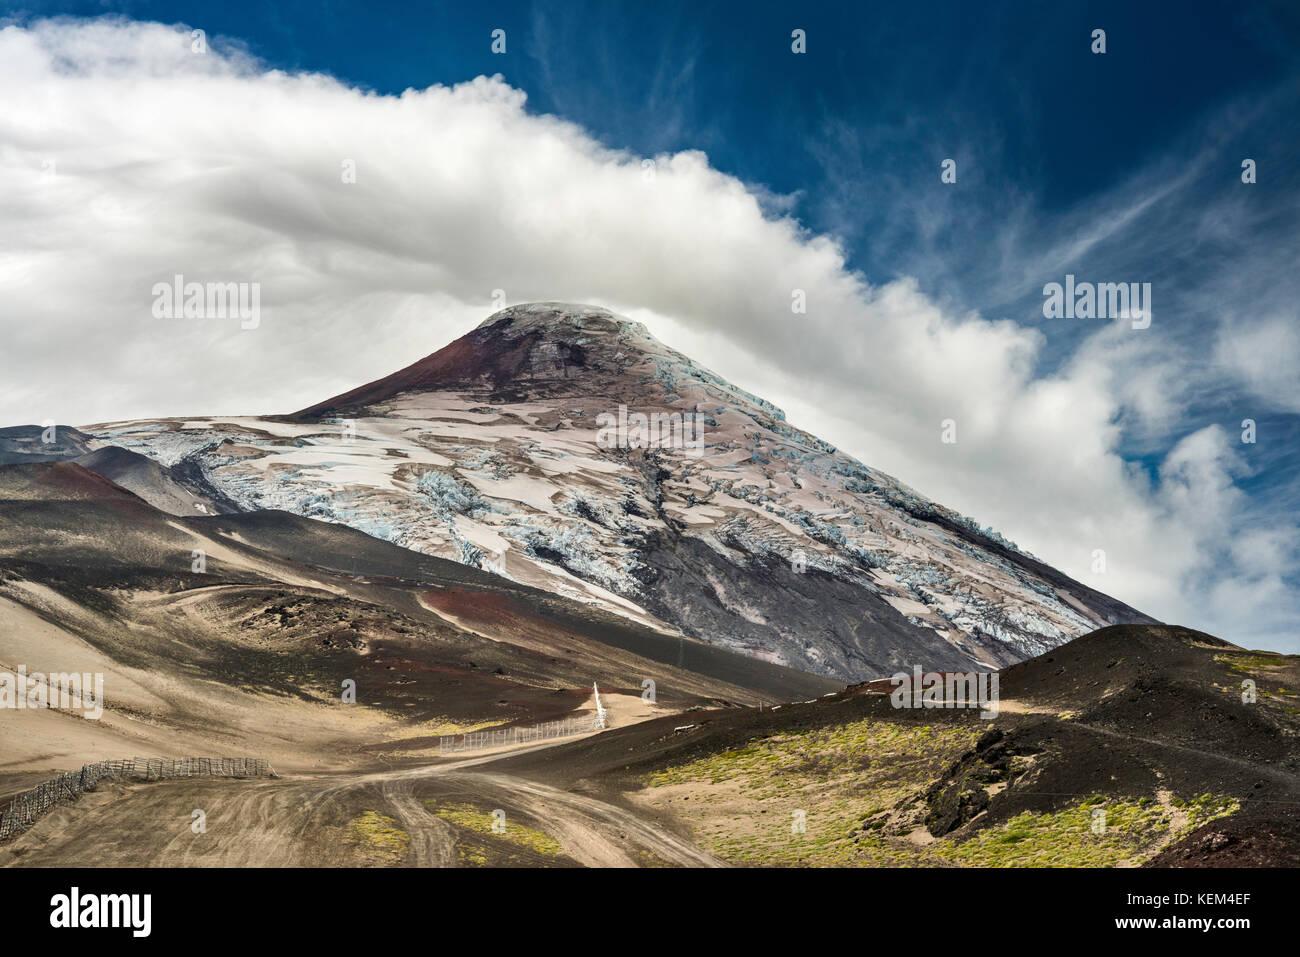 Volcan Osorno, Vicente Perez Rosales National Park, Los Lagos Region, Patagonien, Chile Stockbild